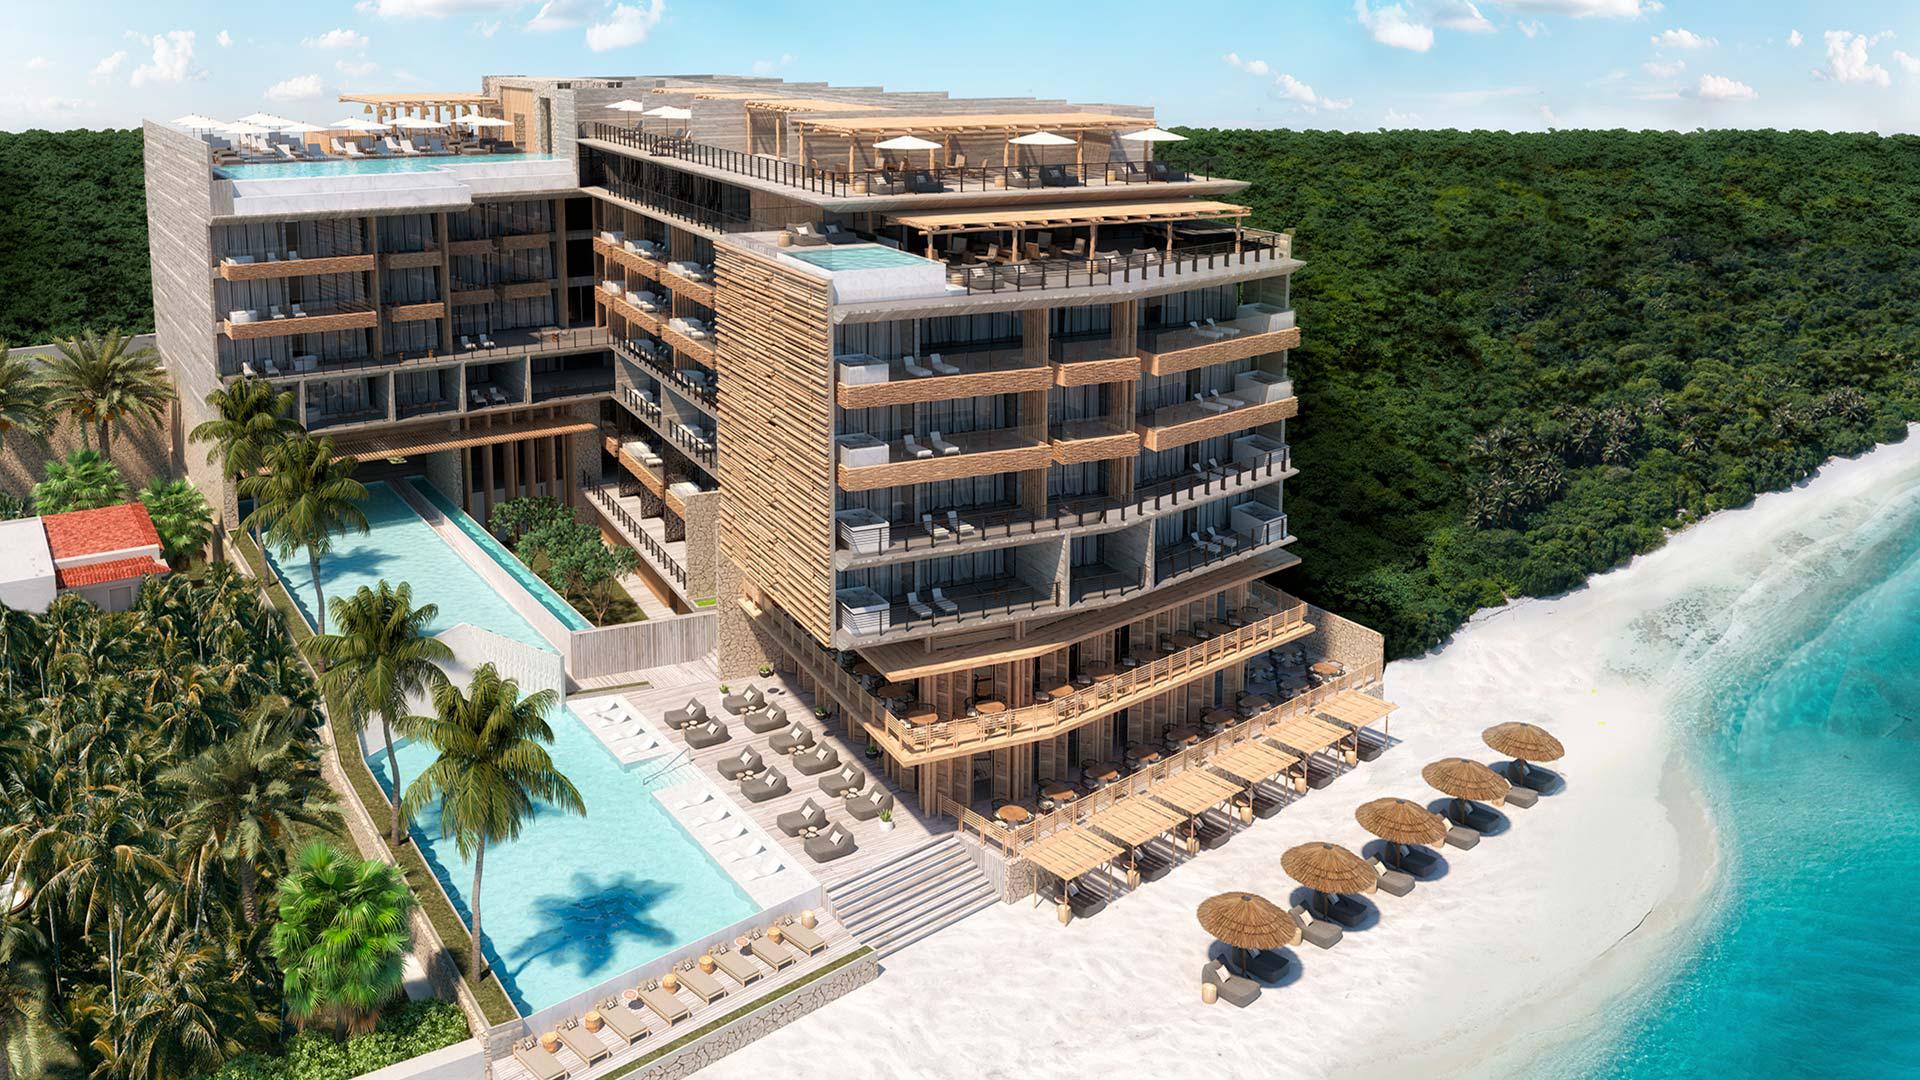 Ro Marley Beach House:  La joya bohemia de Puerto Morelos